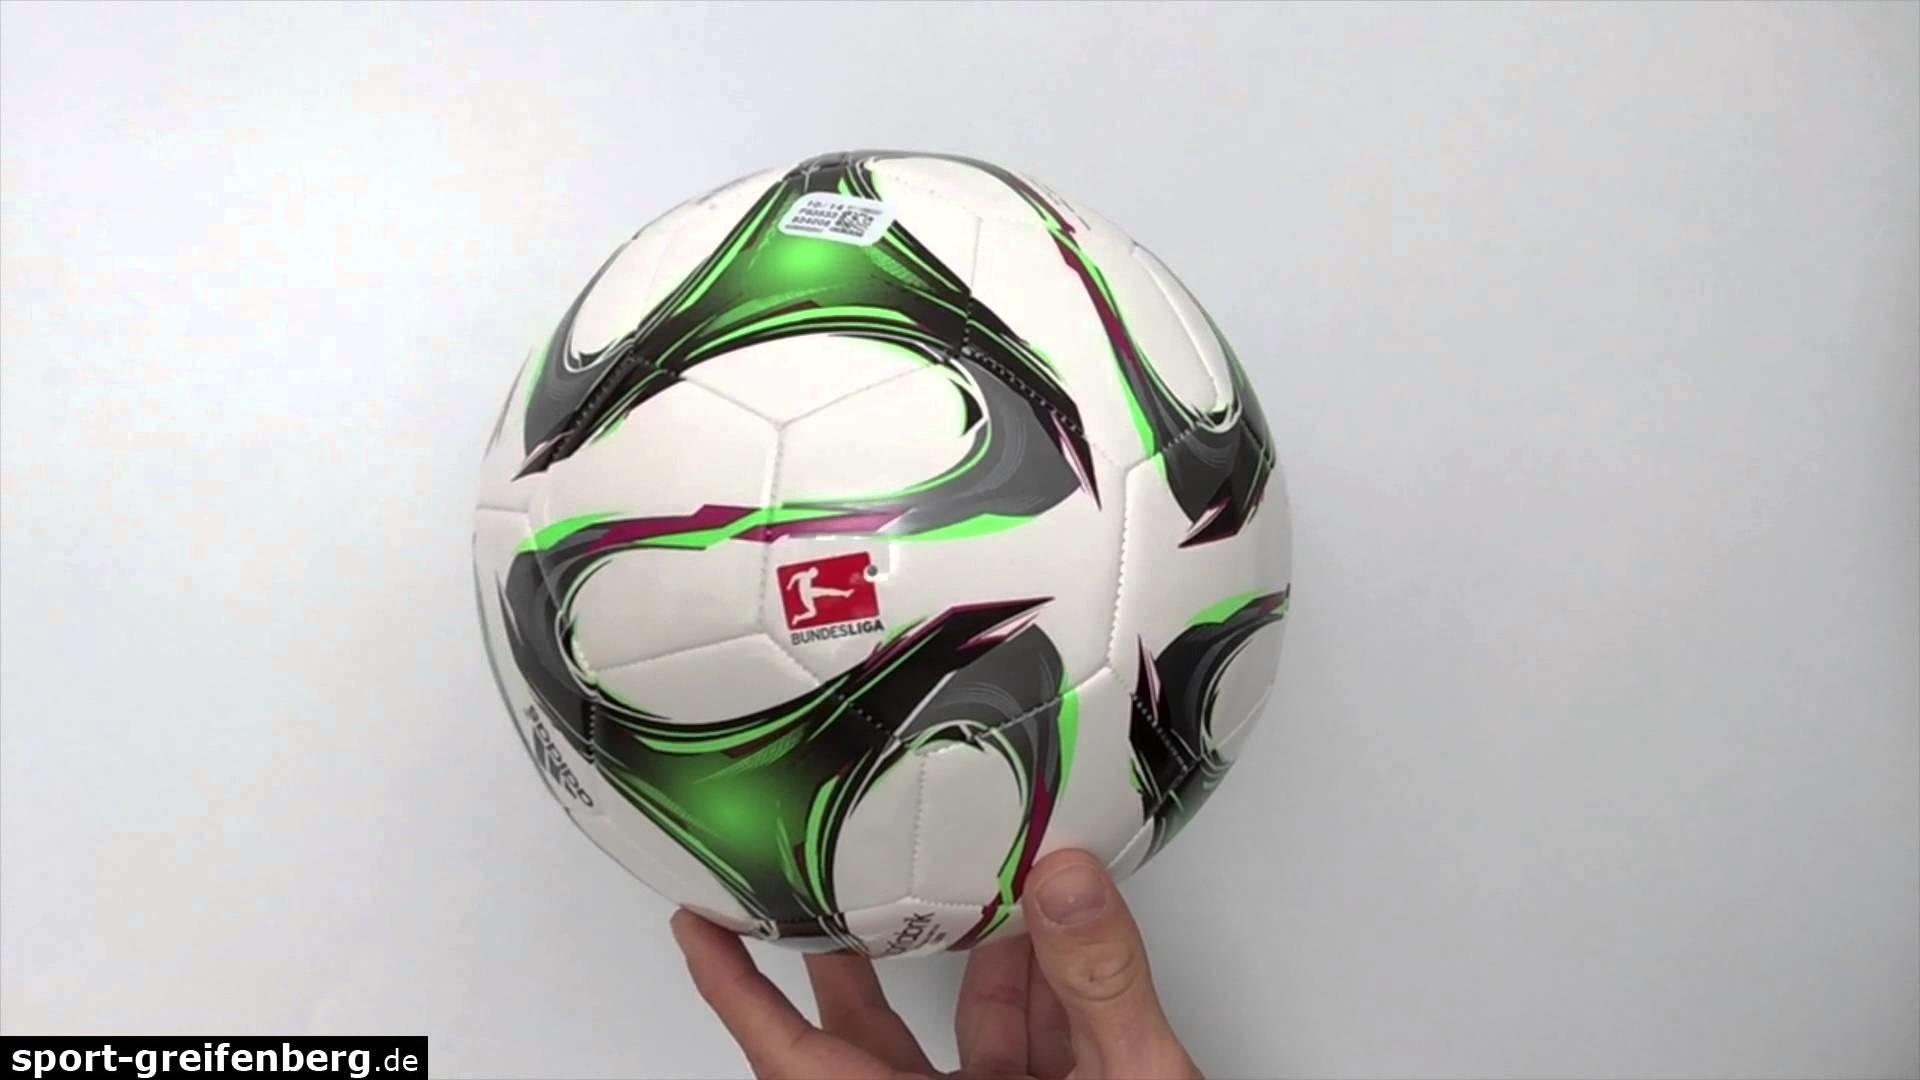 Adidas Torfabrik 2015 Glider Ball- Fussball